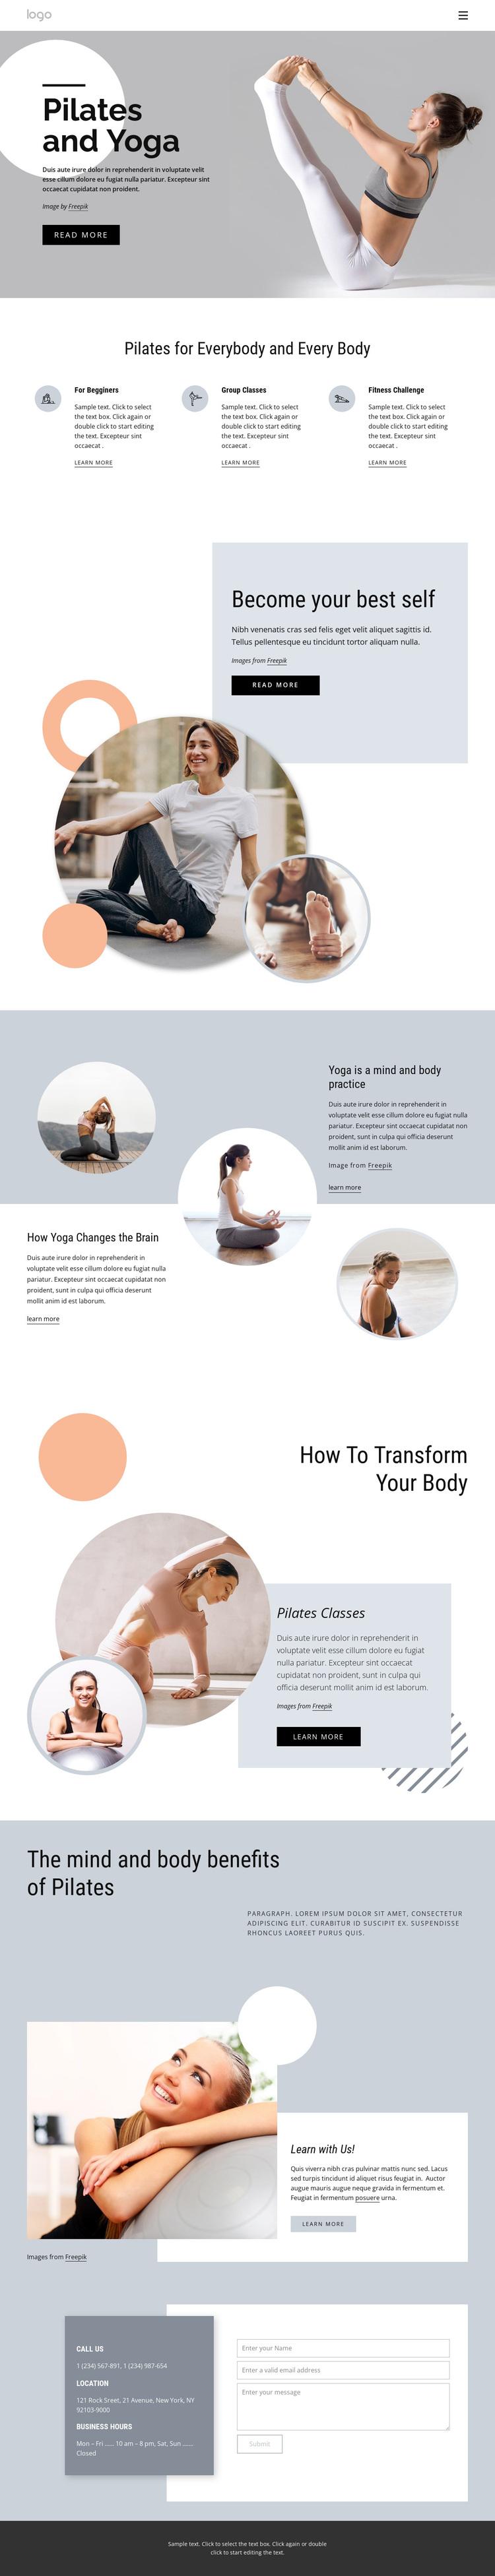 Pilates and yoga center Joomla Page Builder